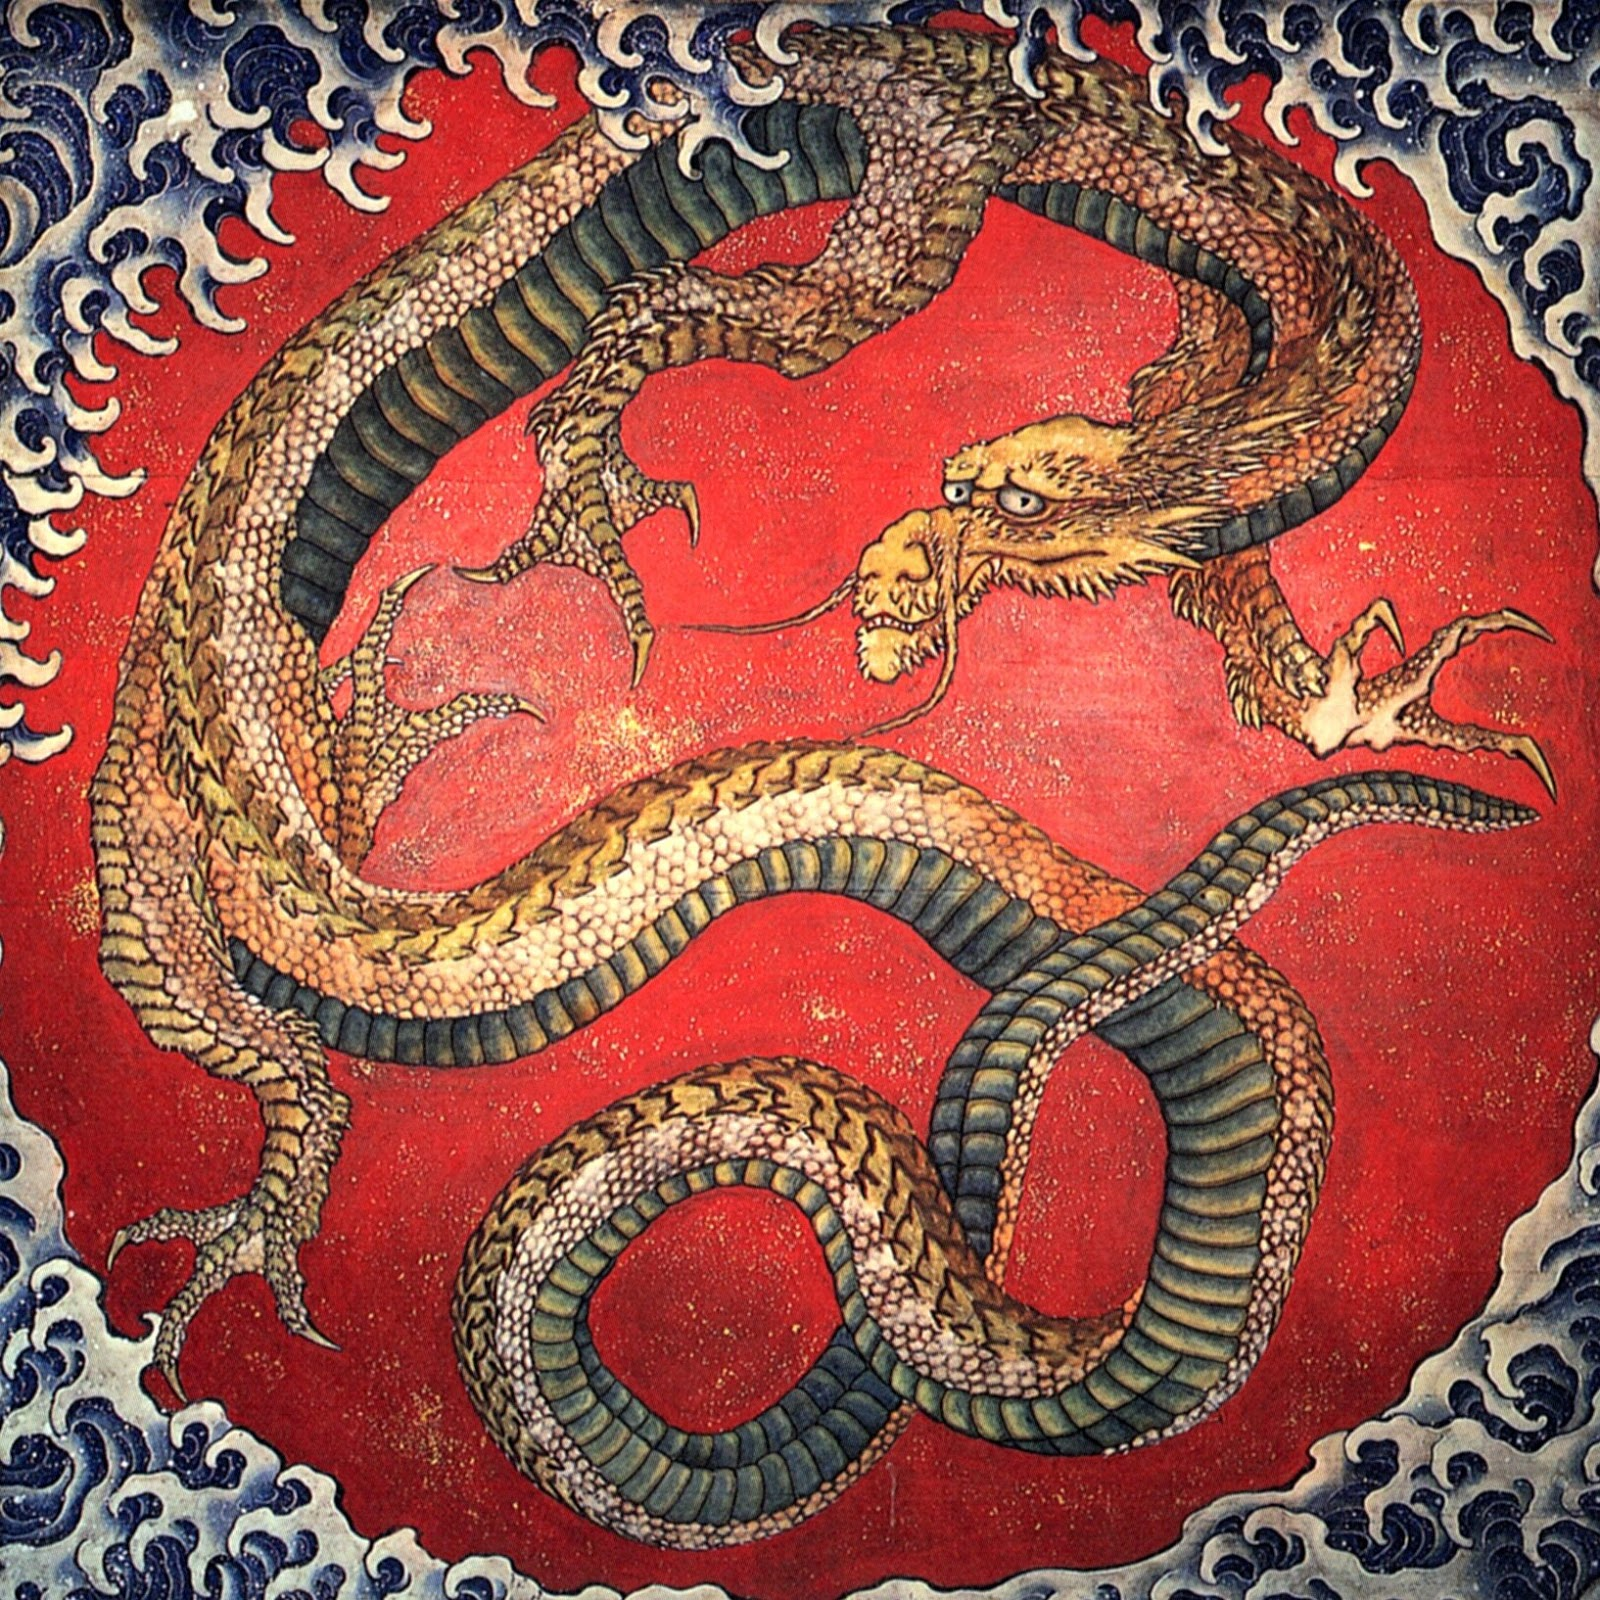 Korean Dragons Mythology: Tattoo